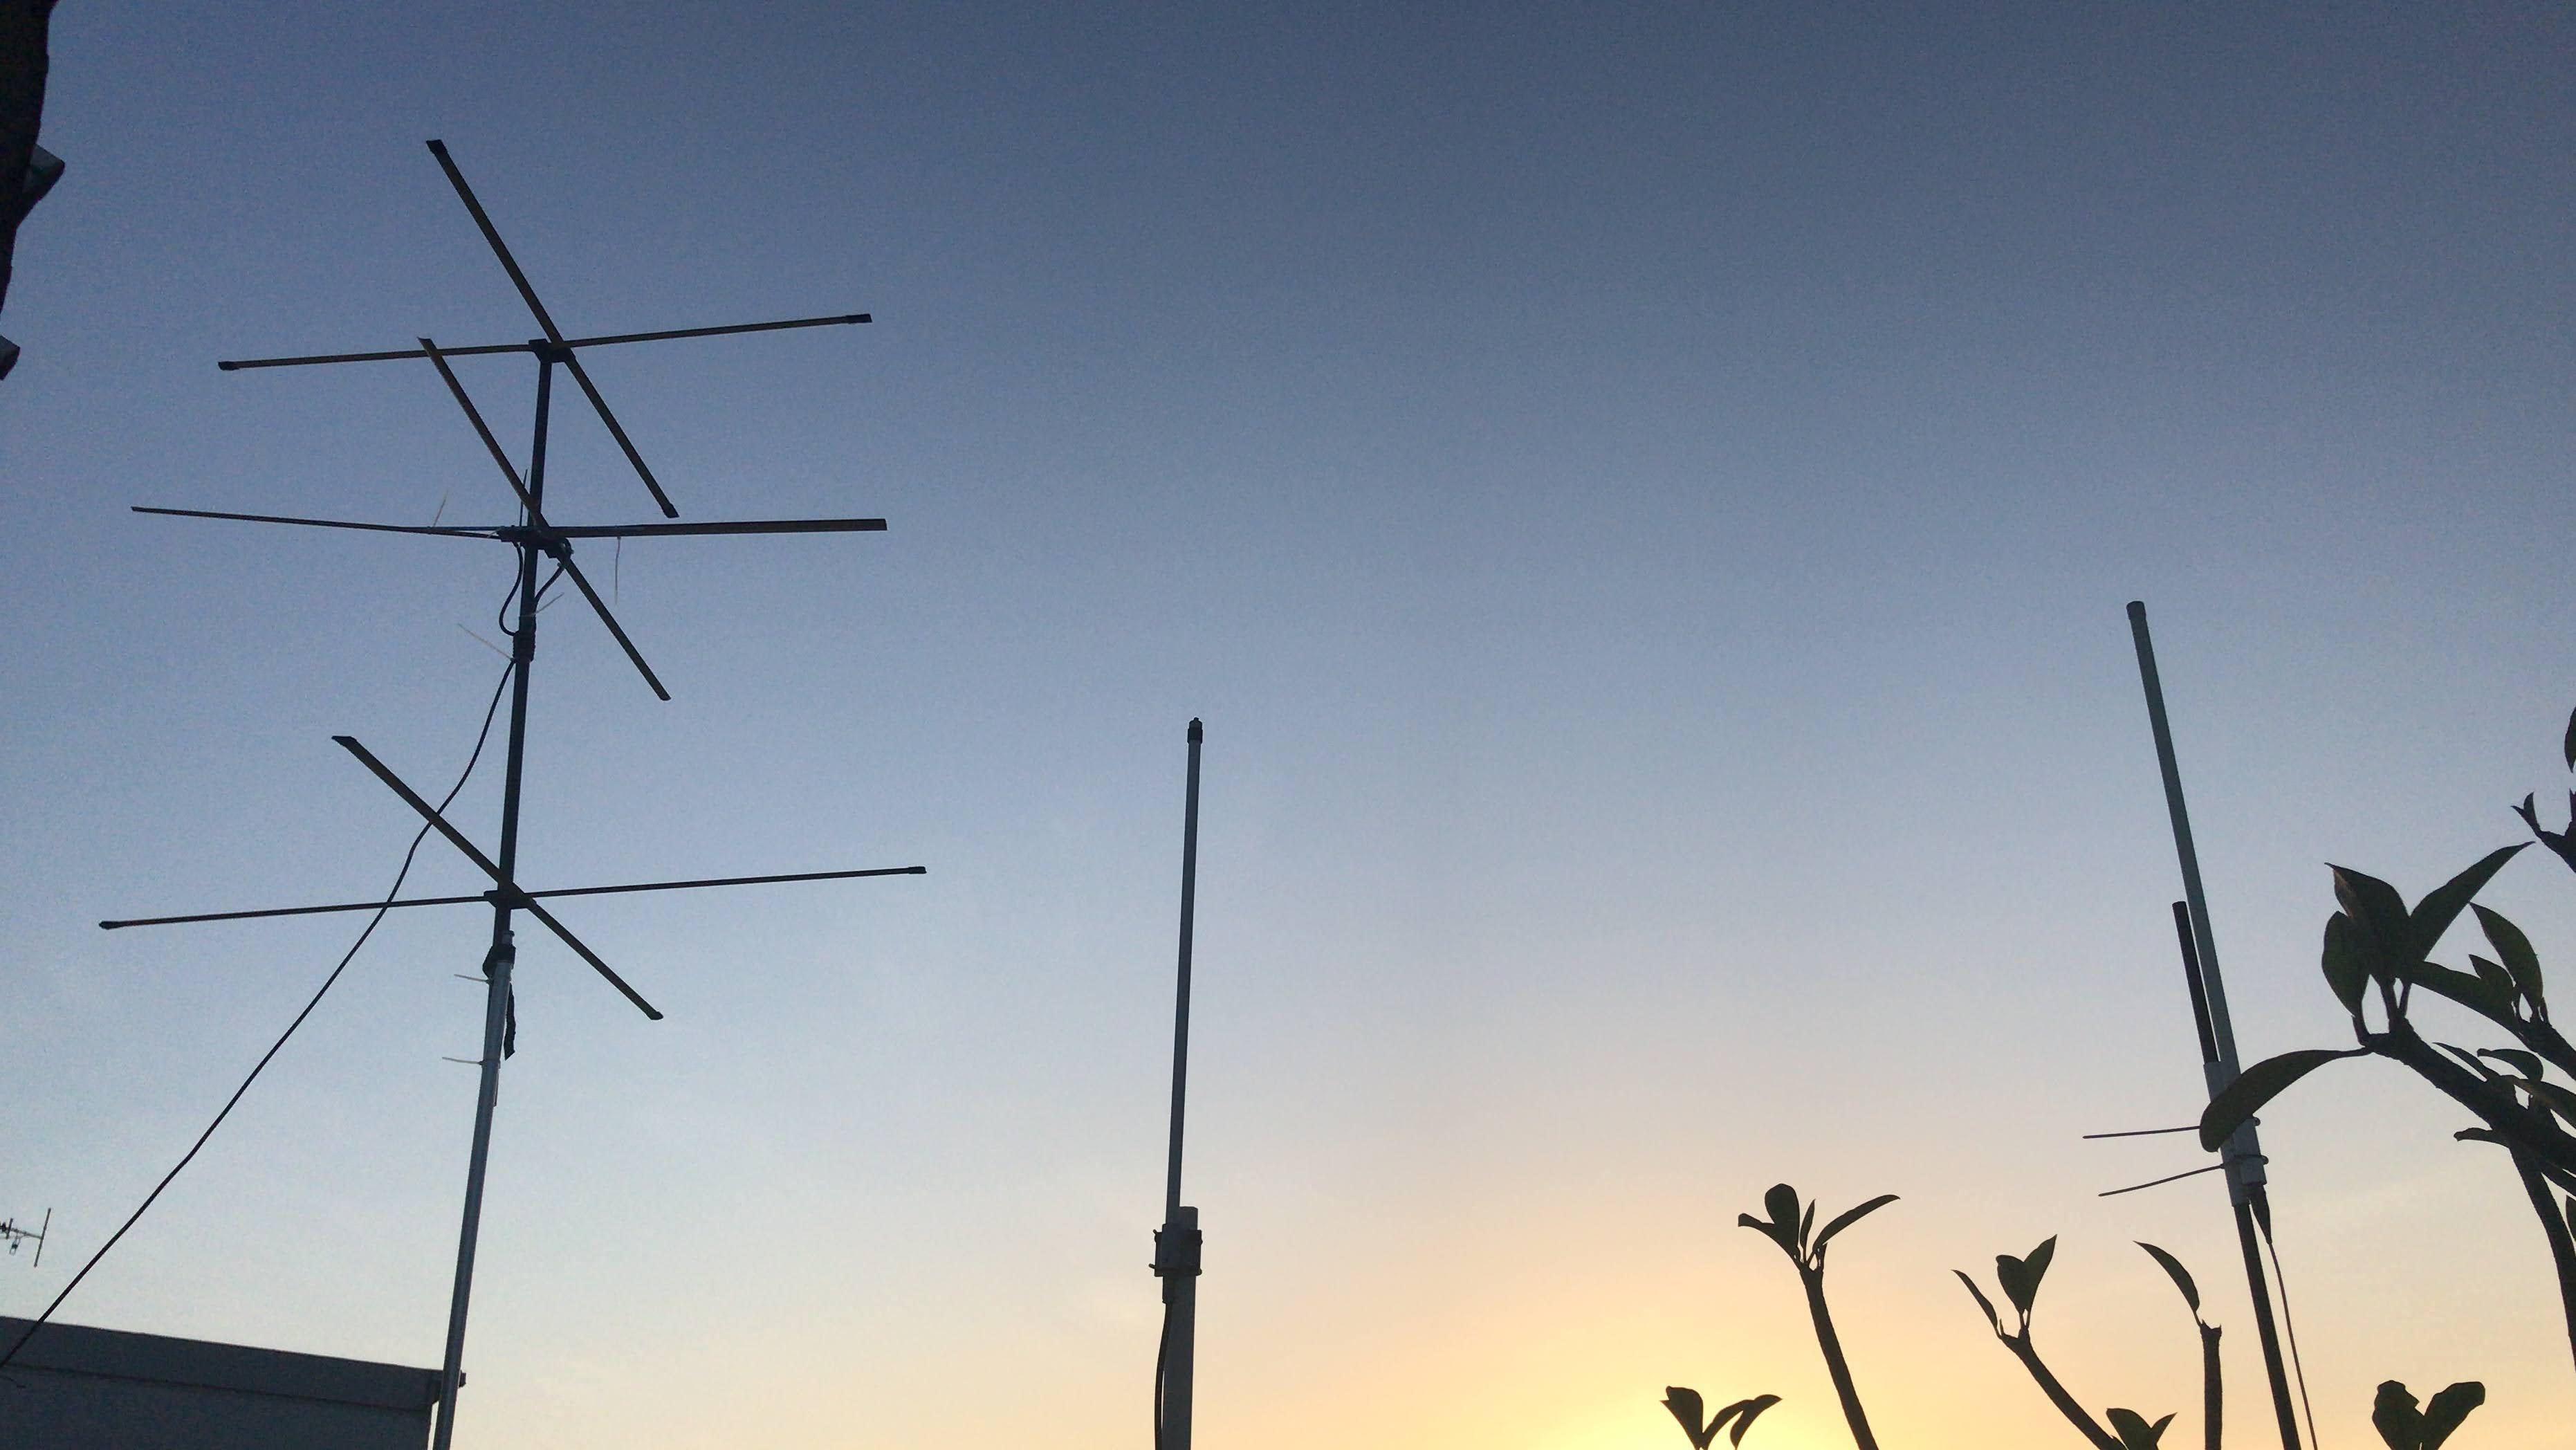 Martin 9V1RM - UHF